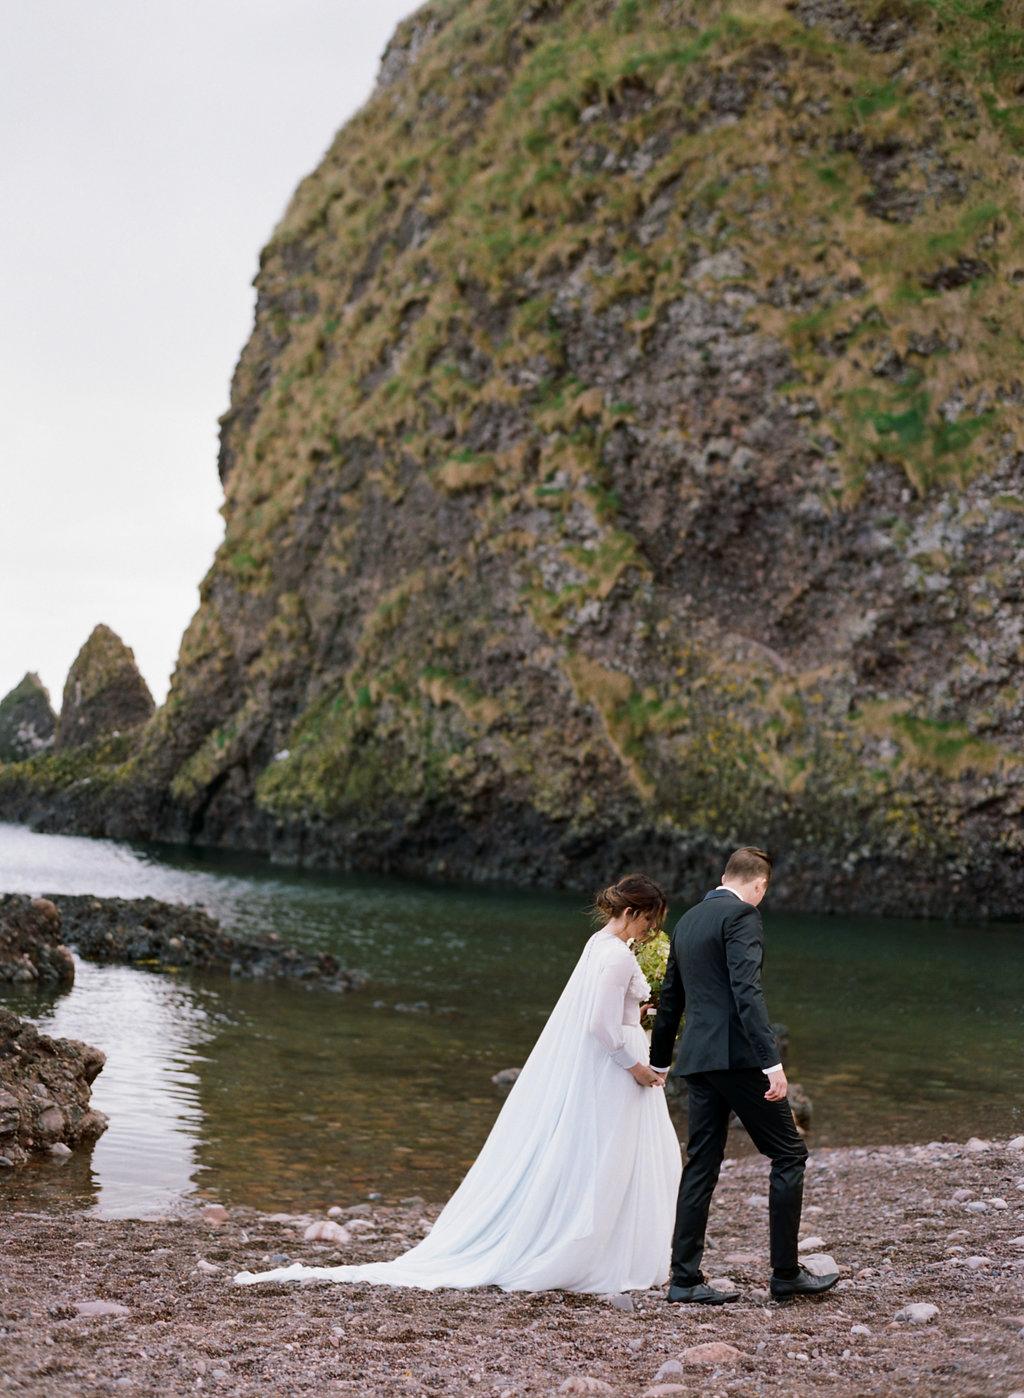 Scotland-Prewedding-highlands-castle-Engagment-Photos-Katie-Grant (99 of 139).jpg